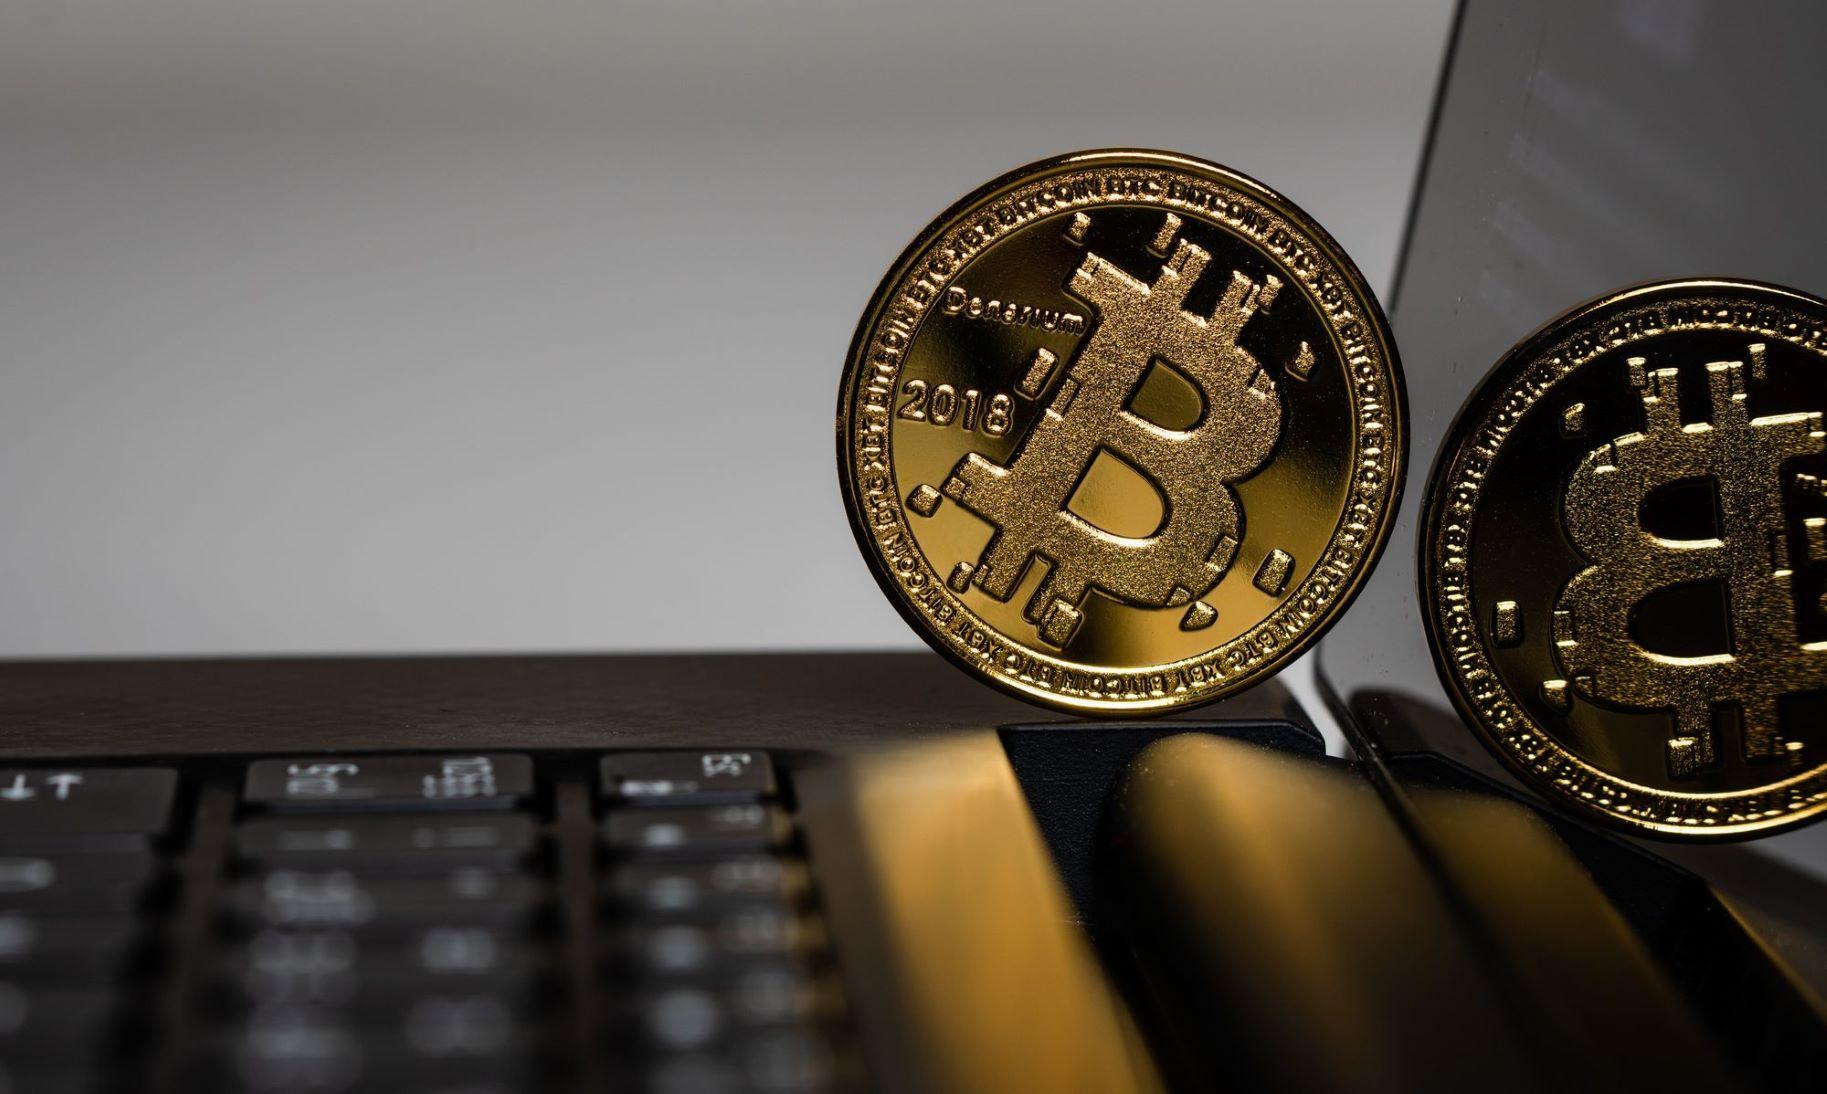 Canadian Company 3iQ to List Bitcoin Fund